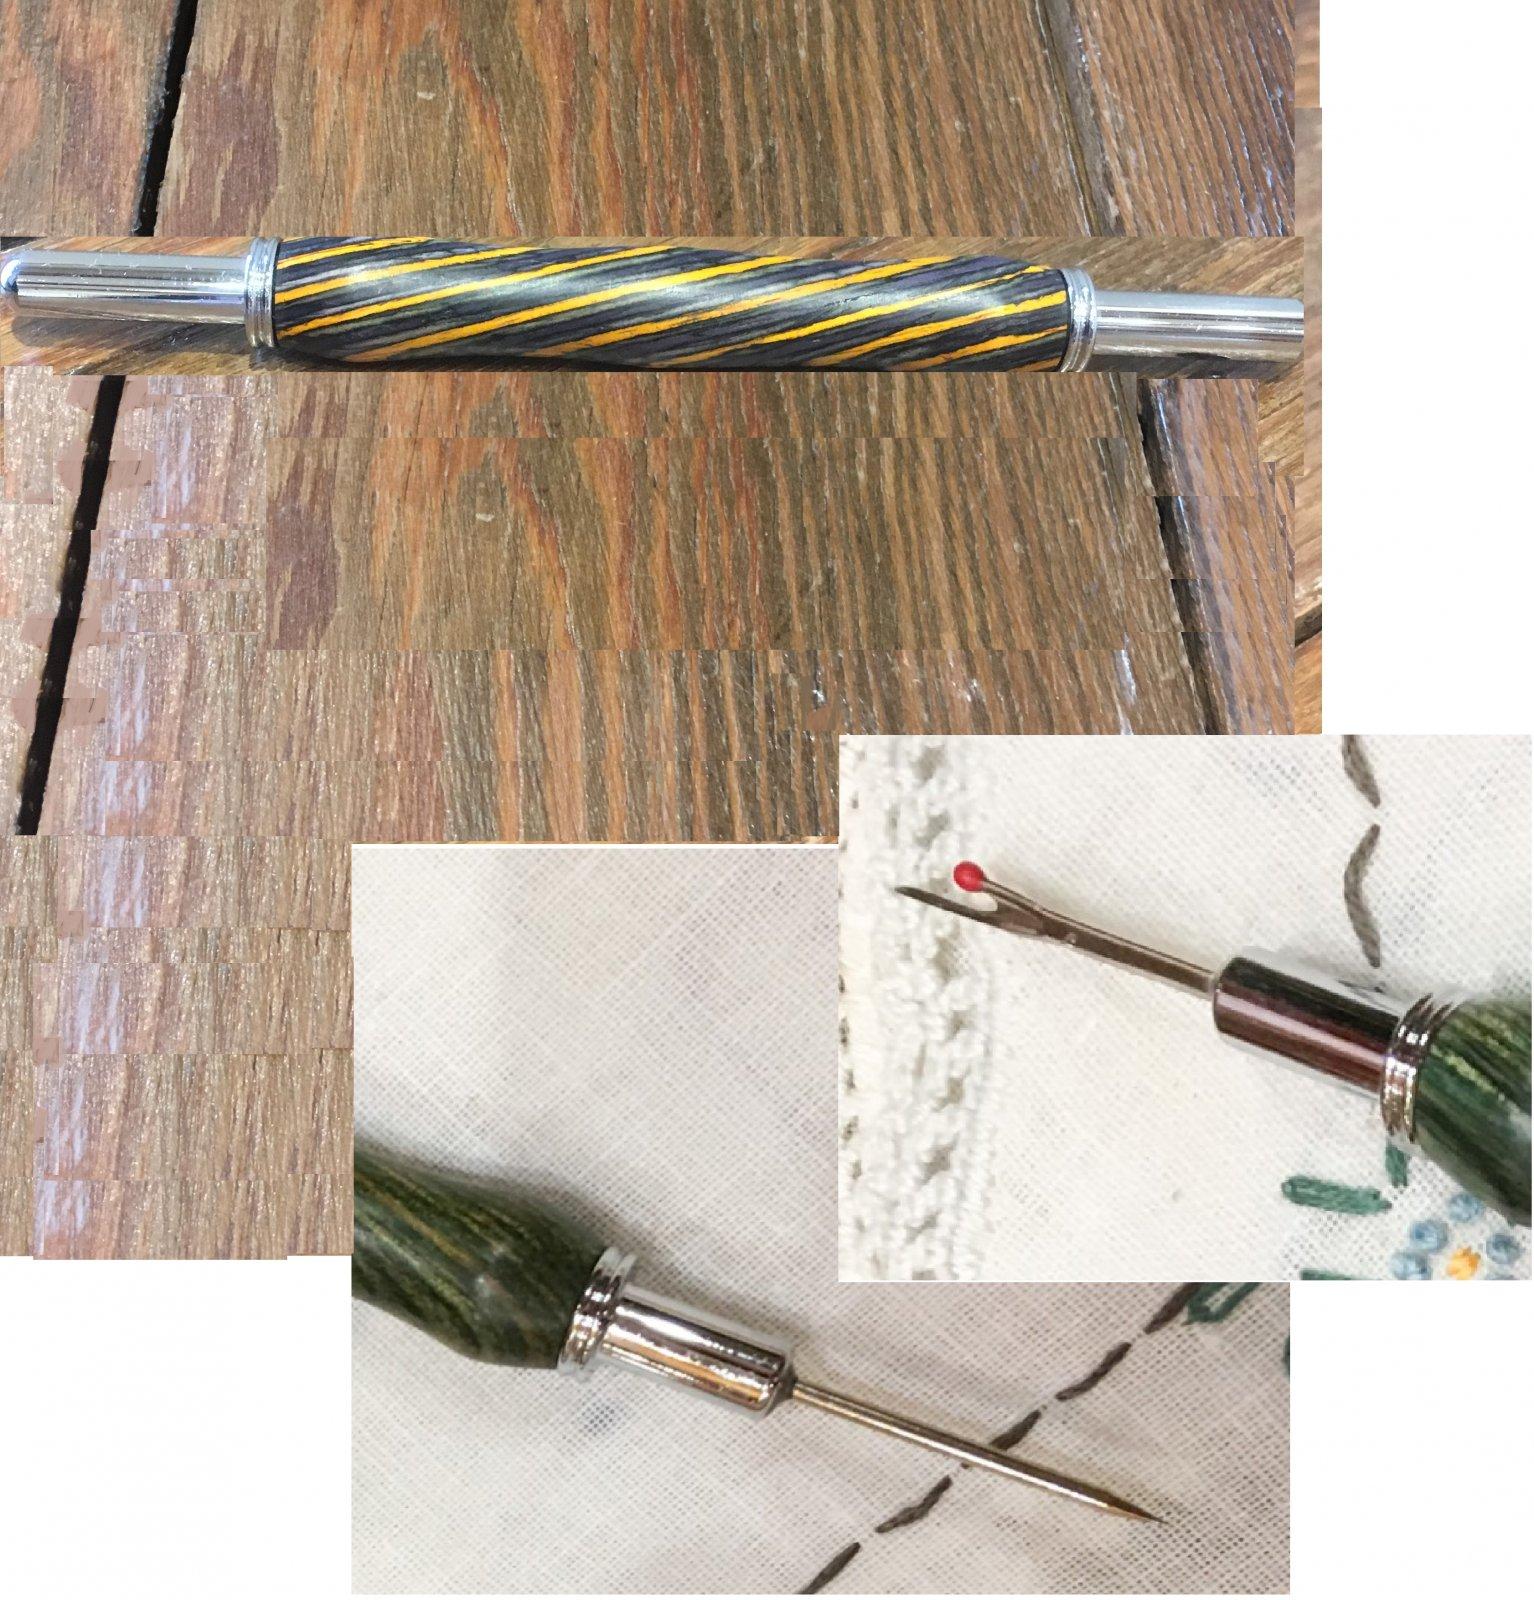 Wood Stiletto & Seam Ripper Combo Tool - Grey & Yellow